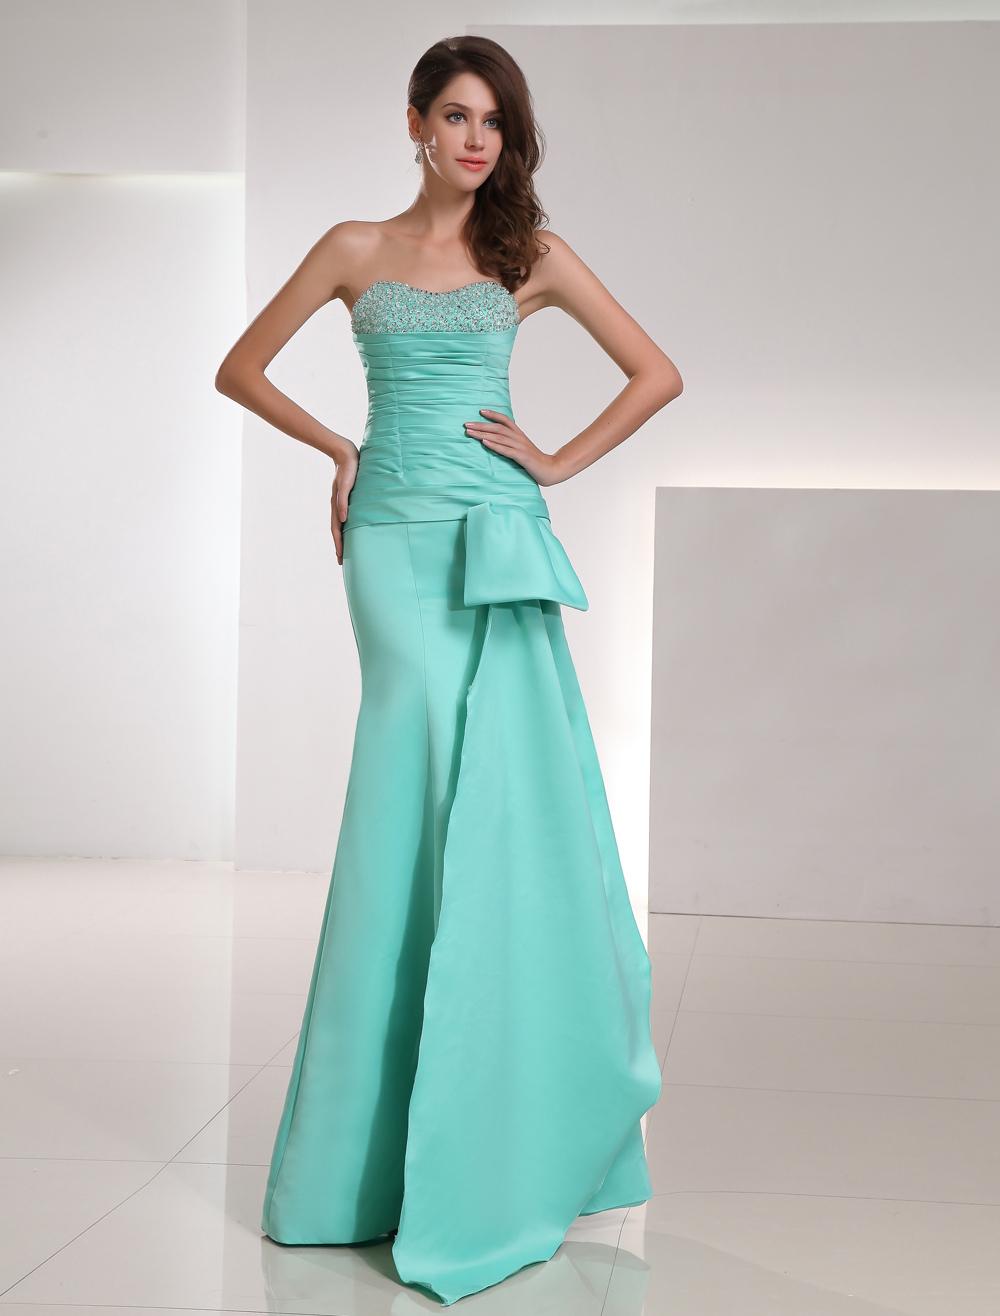 Mermaid Evening Dress Strapless Sweetheart Satin Long Prom Dress Mint Green Beading Ruched Floor Length Party Dress (Wedding Evening Dresses) photo